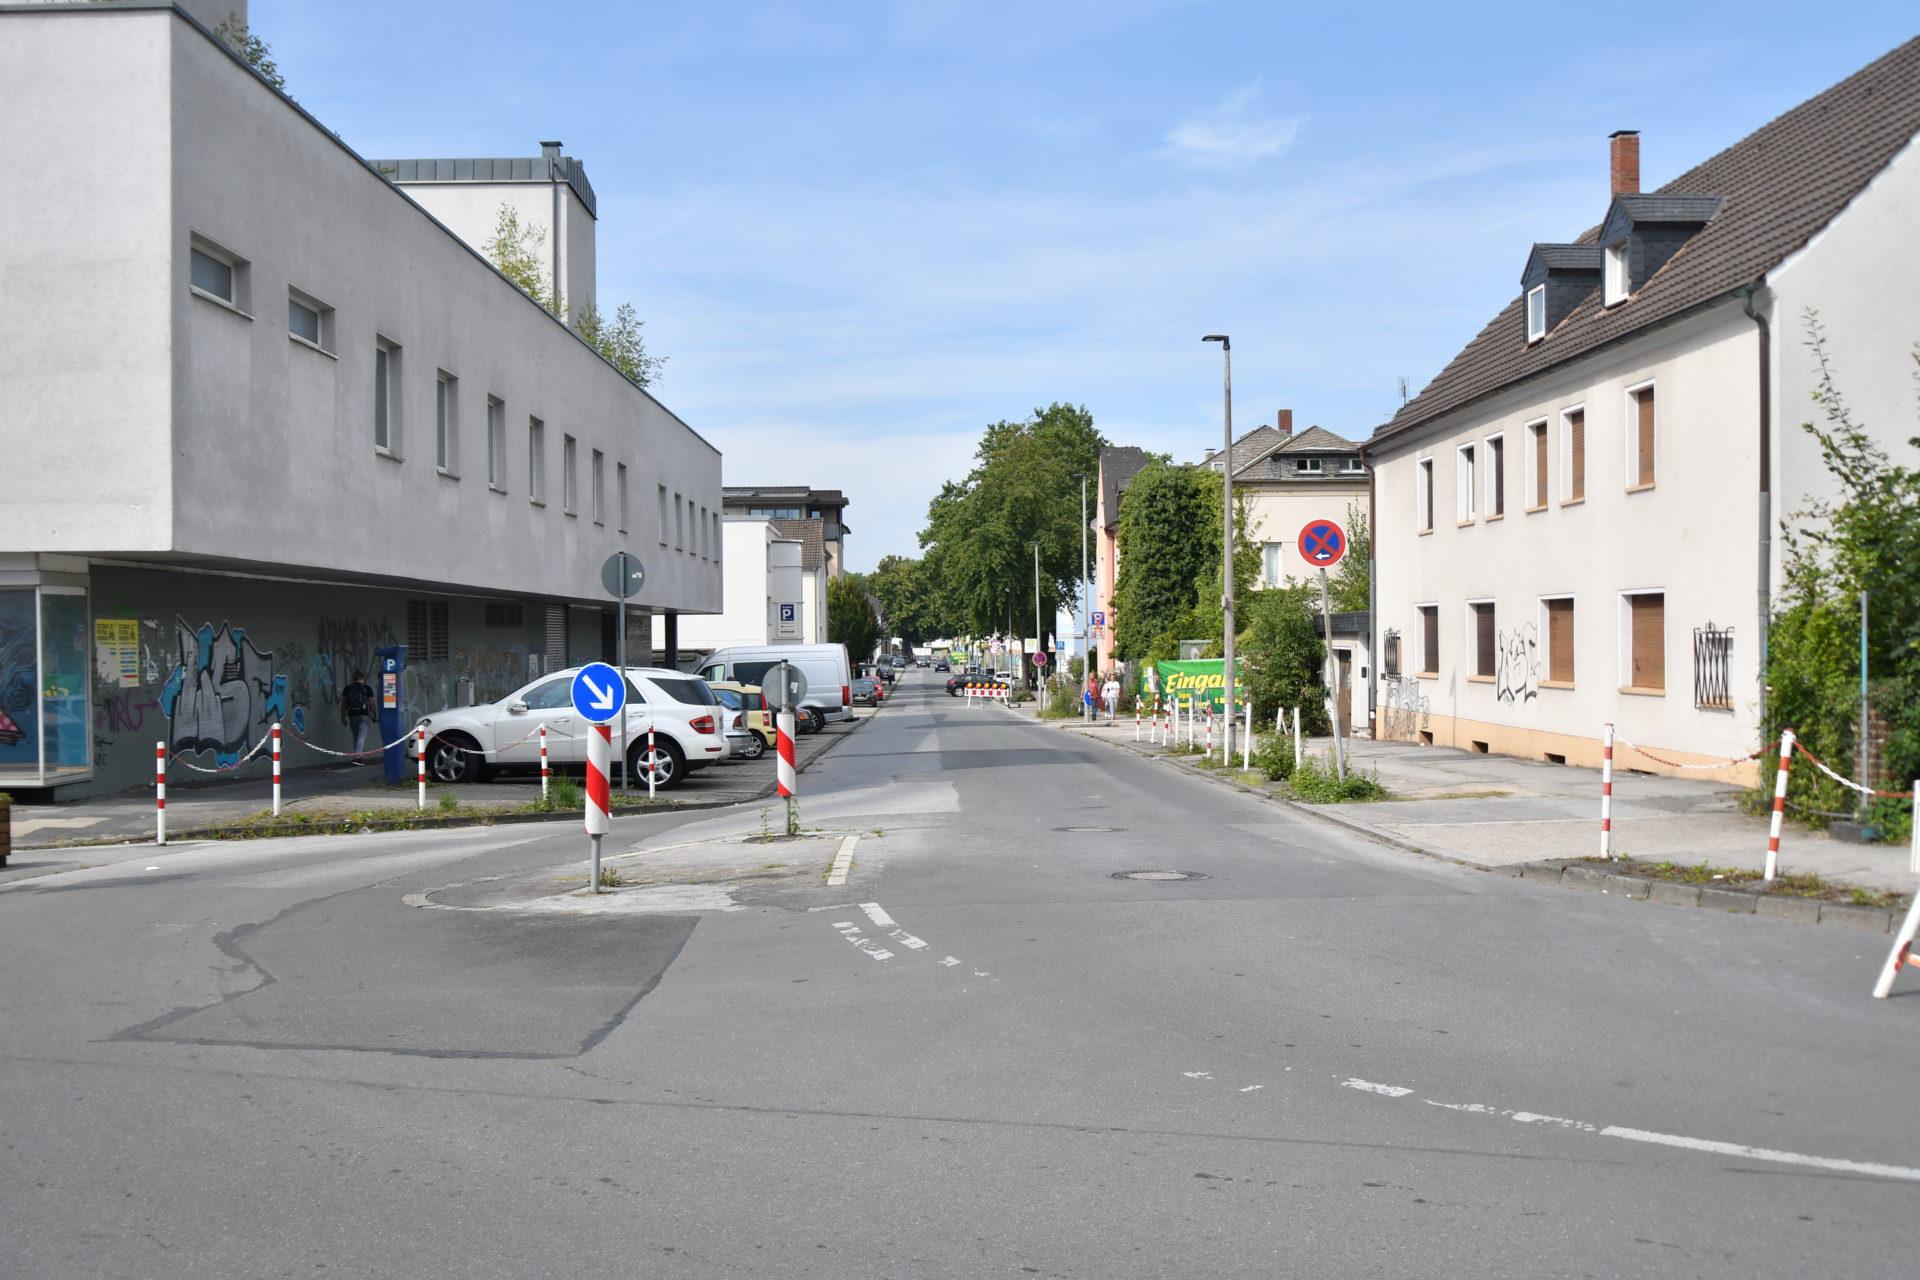 Gartenstraße heute